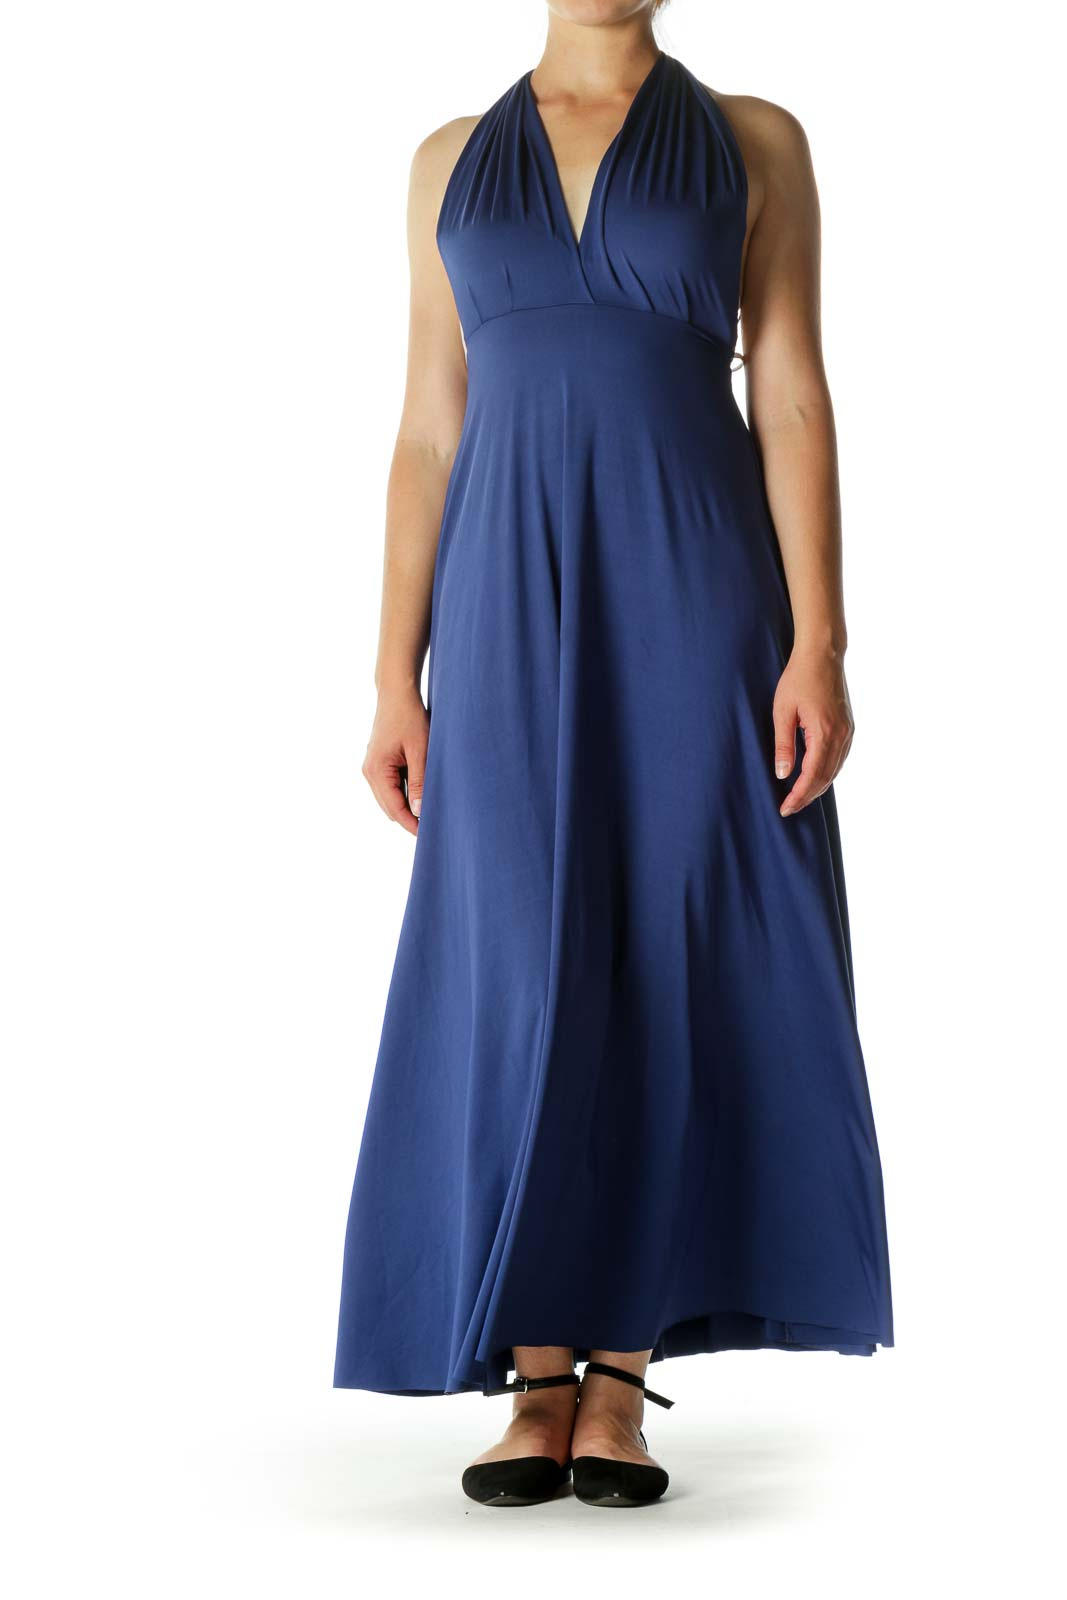 Blue Empire Cut Stretch Evening Dress